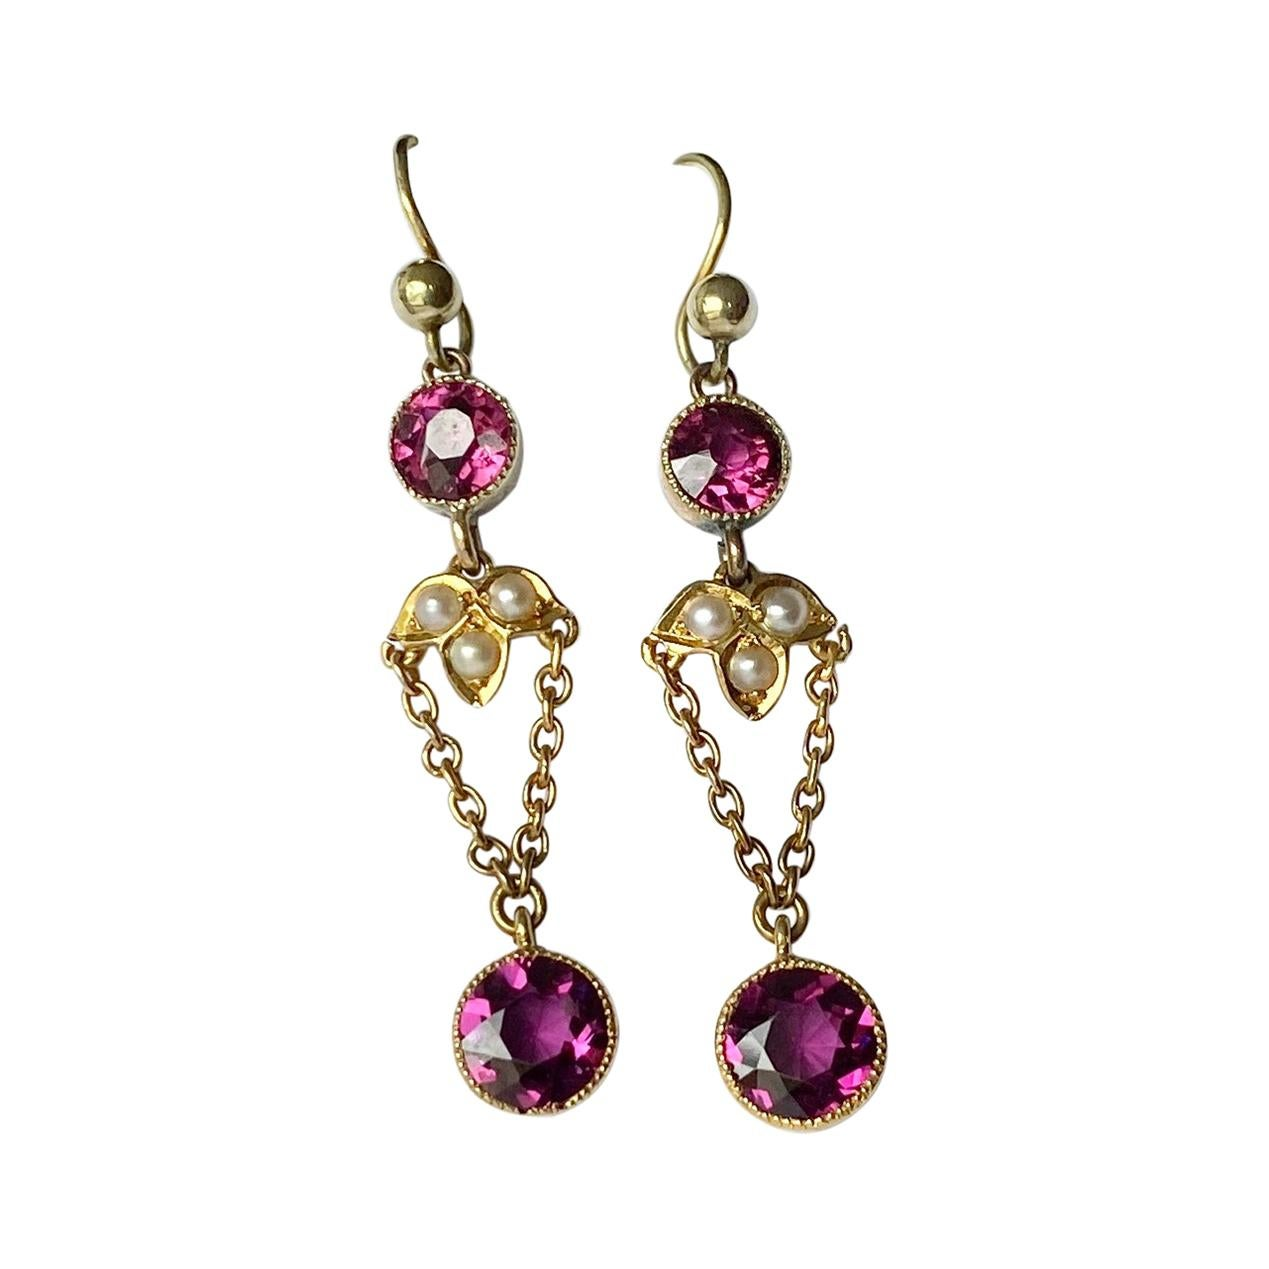 Edwardian Amethyst, Pearl and 9 Carat Gold Drop Earrings